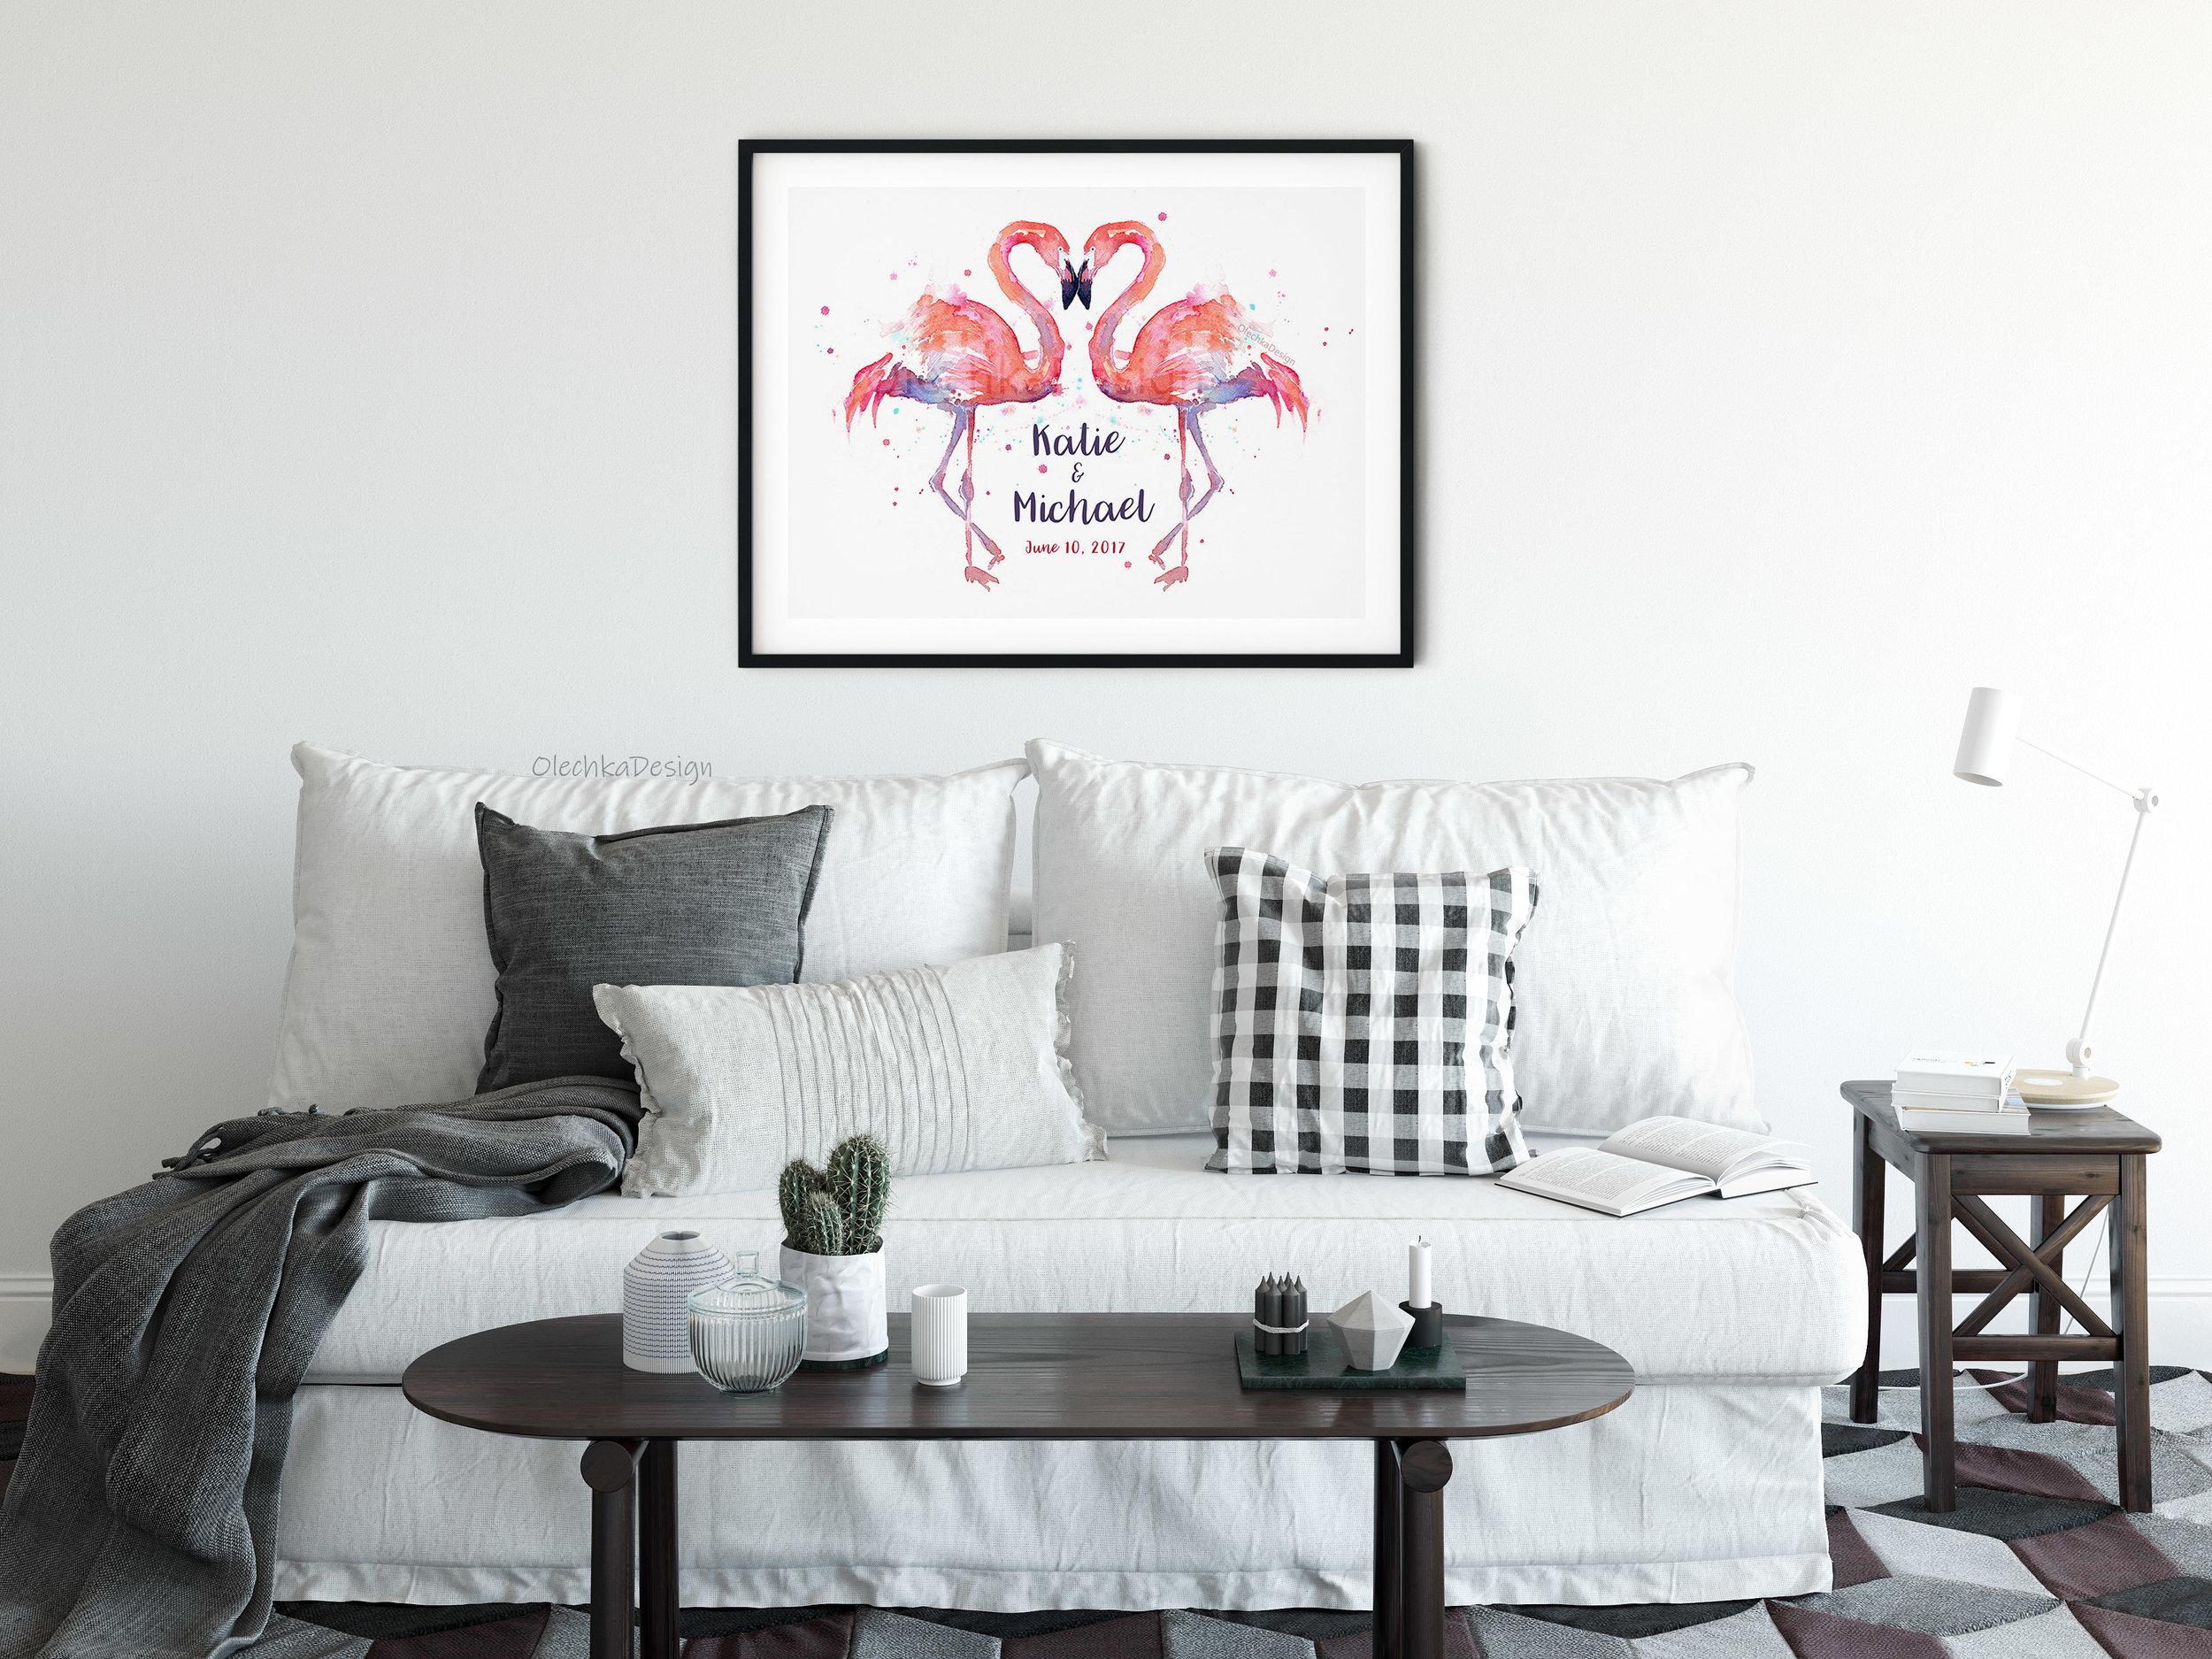 flamingo-custom-print-personalized-print.jpg